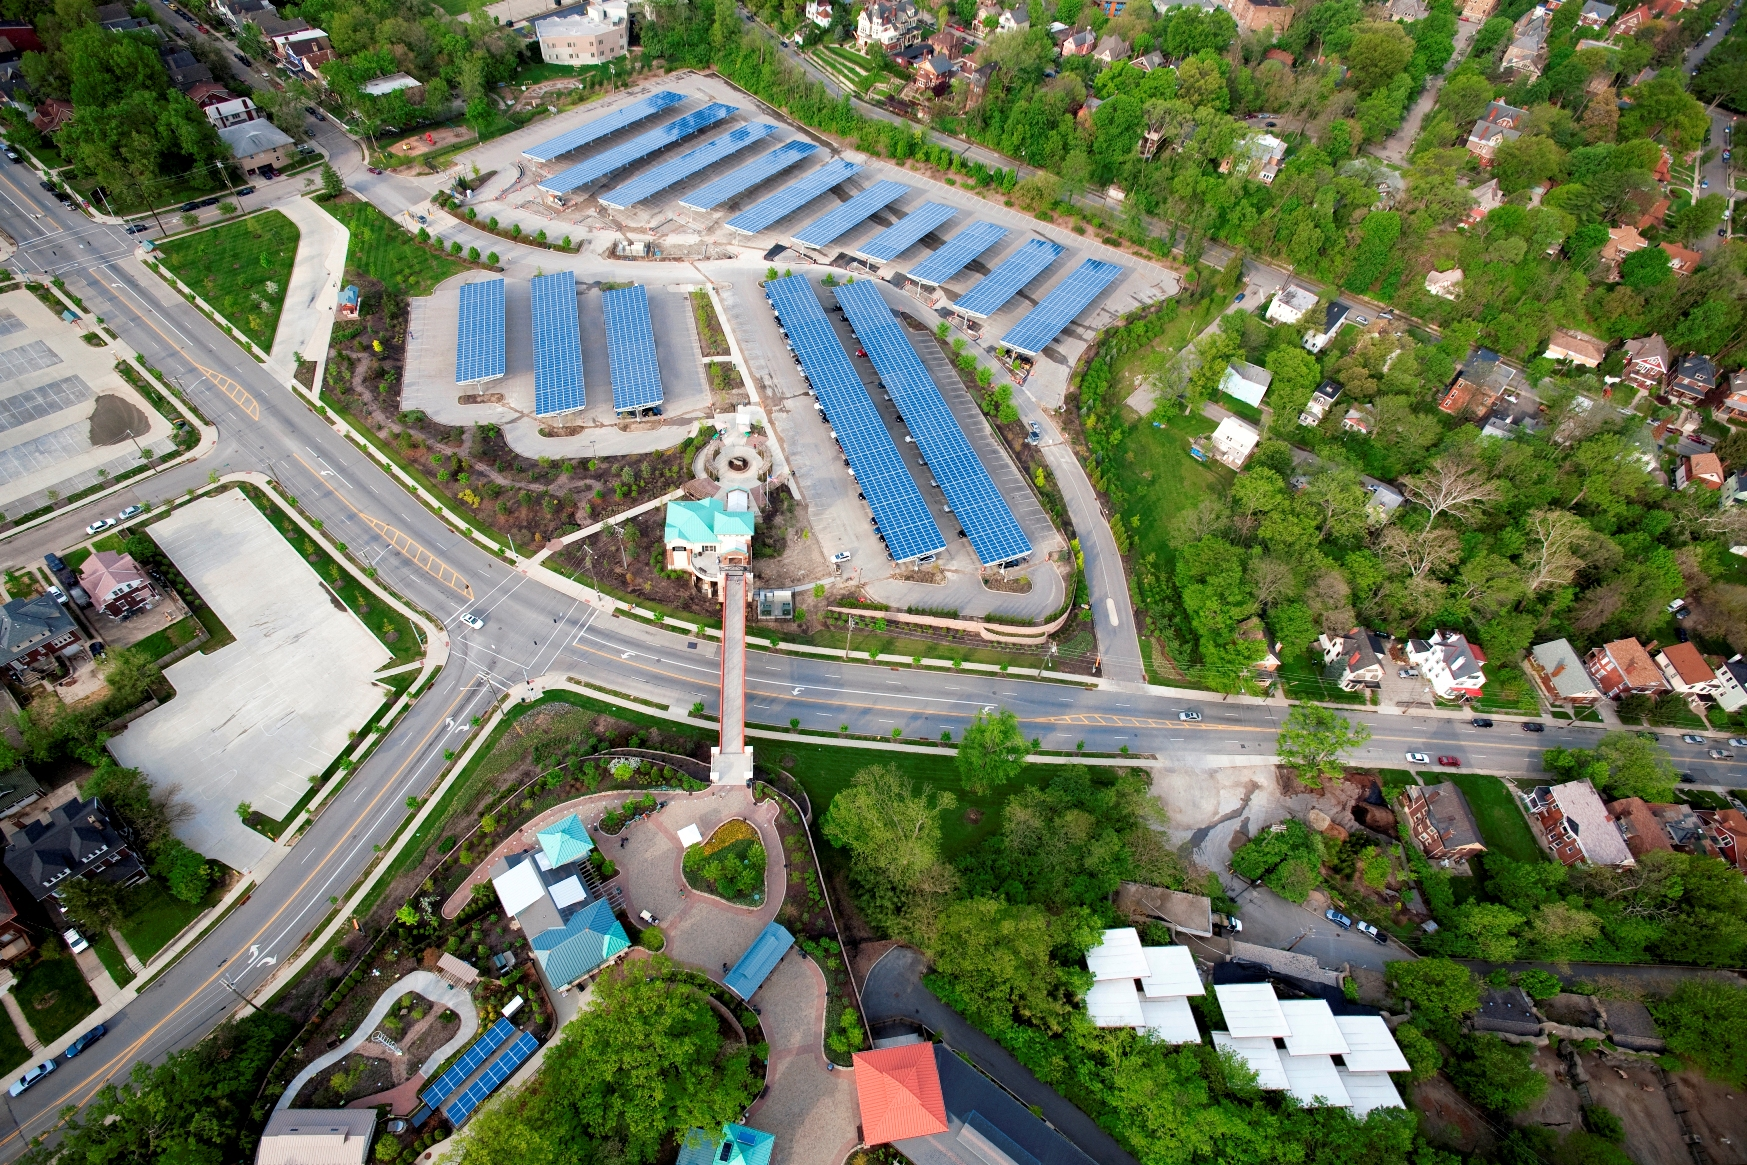 The Cincinnati Zoo & Botanical Garden began generating clean energy from a solar array   on top of the Zoo's Vine Street parking garage.